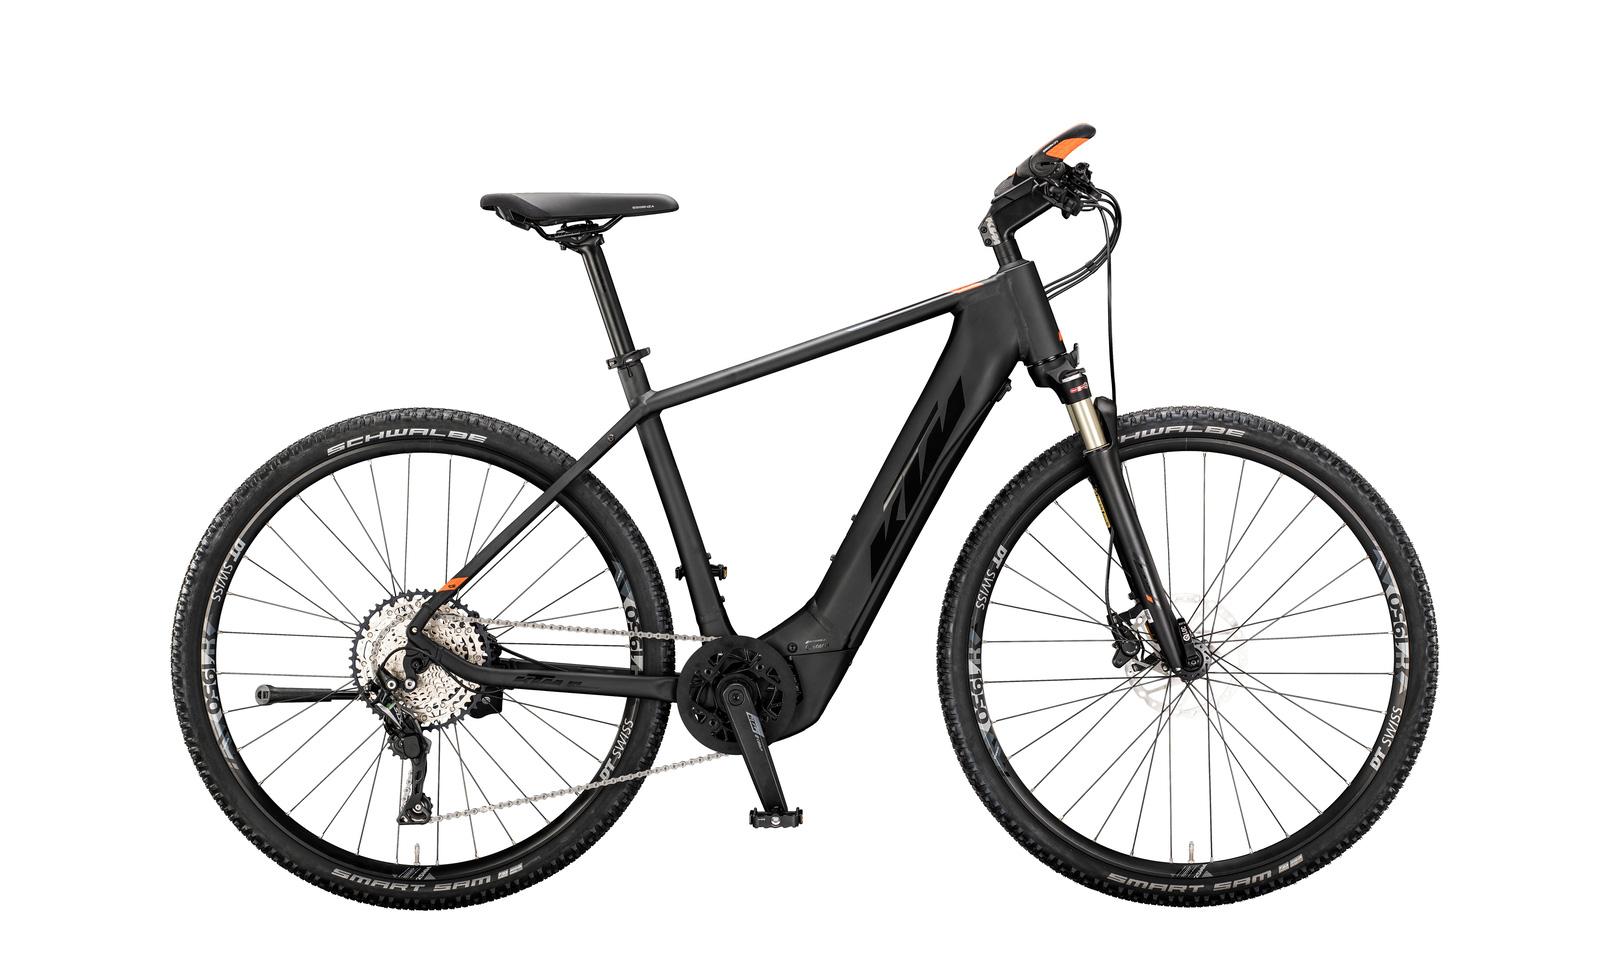 Biciclete electrice KTM E-Offroad MACINA CROSS 610 1x12 Shimano SLX